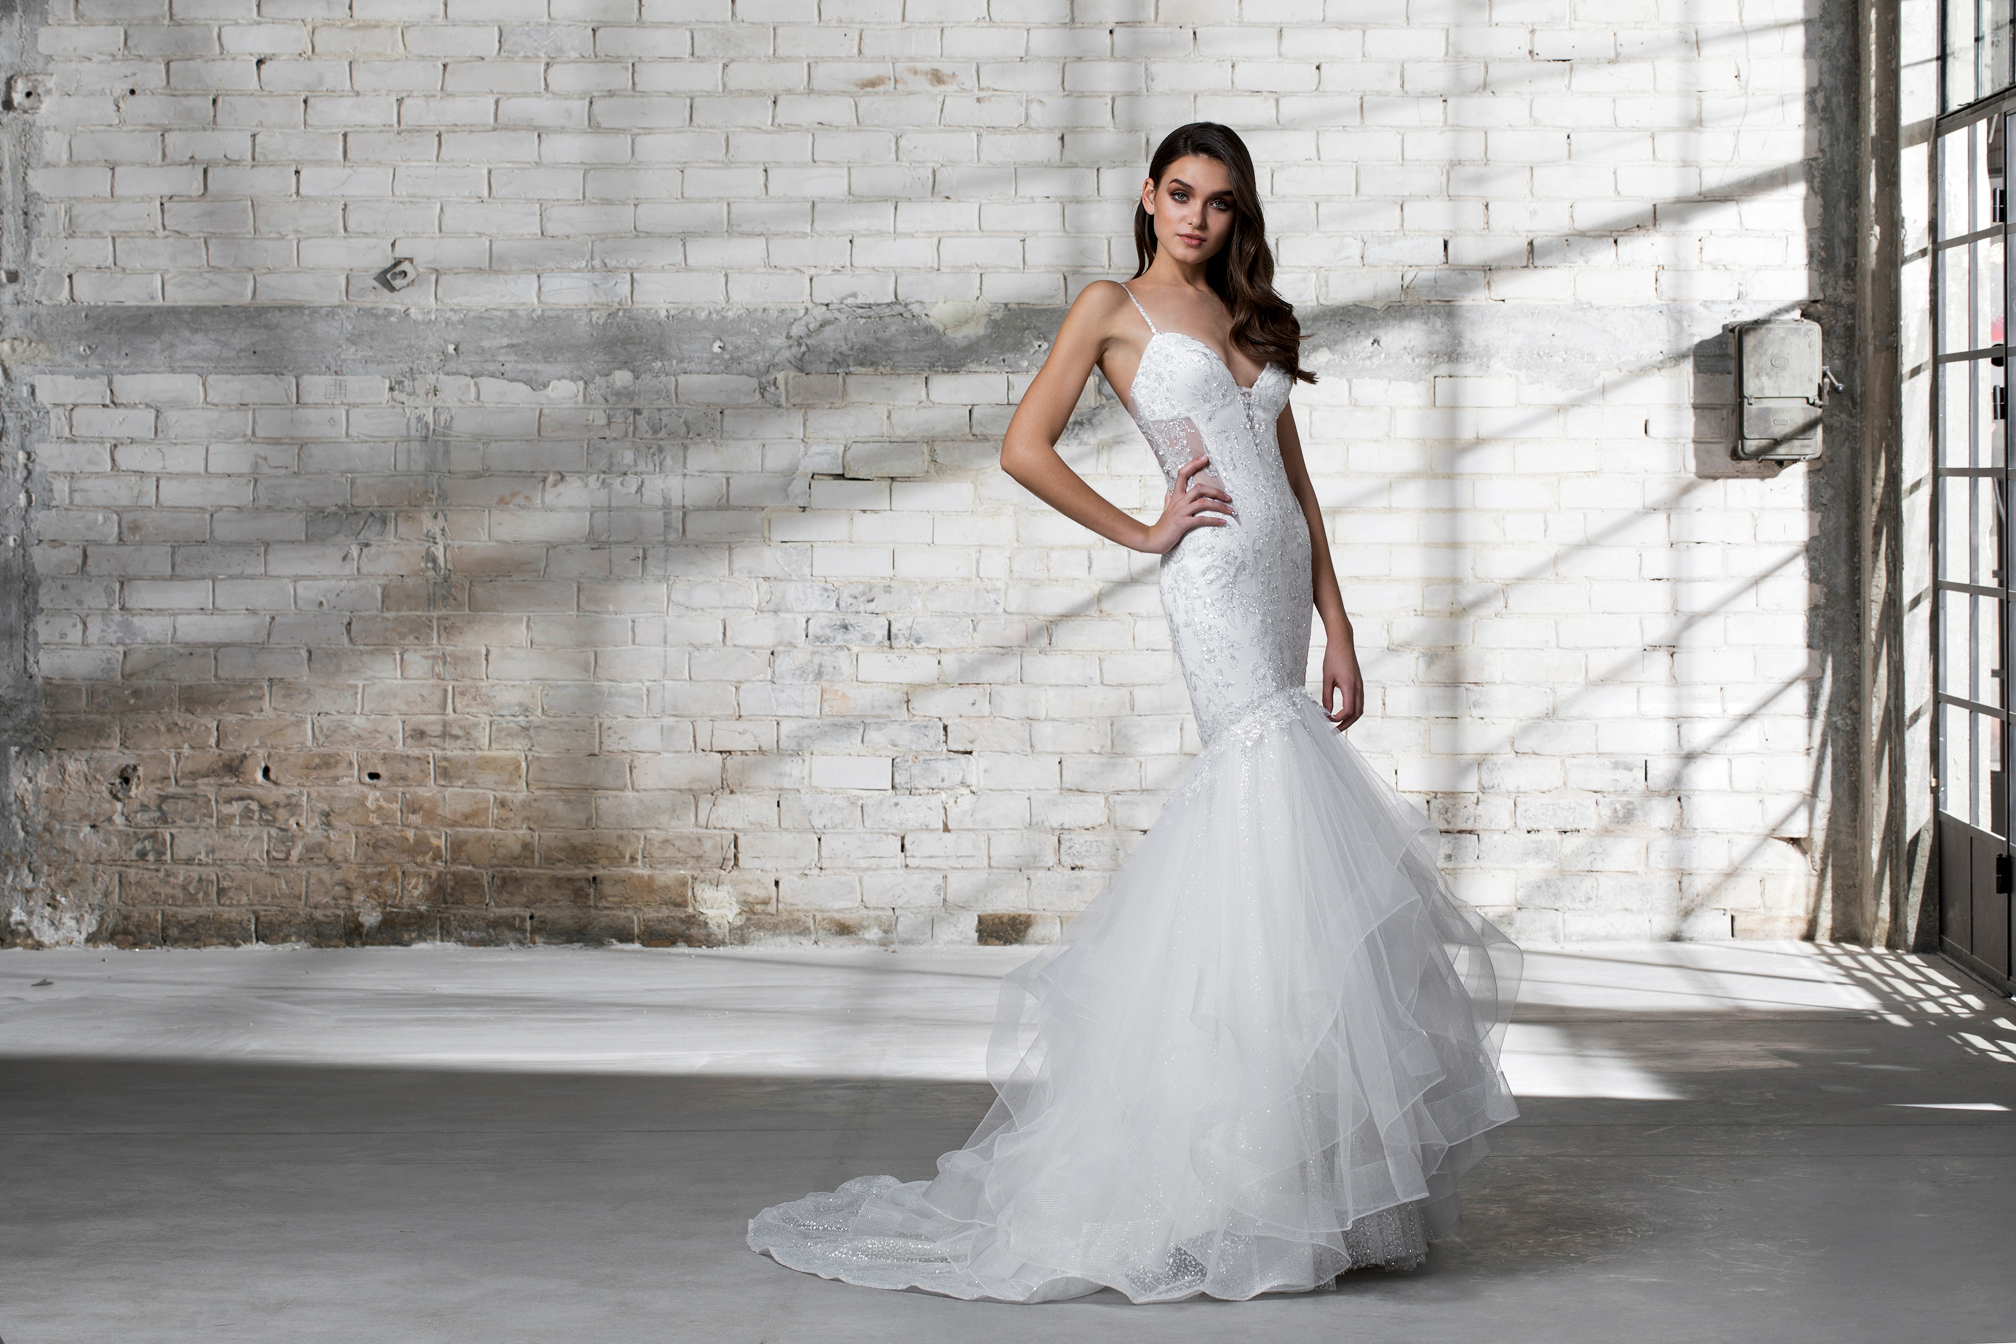 pnina tornai wedding dress spring 2019 mermaid spaghetti strap